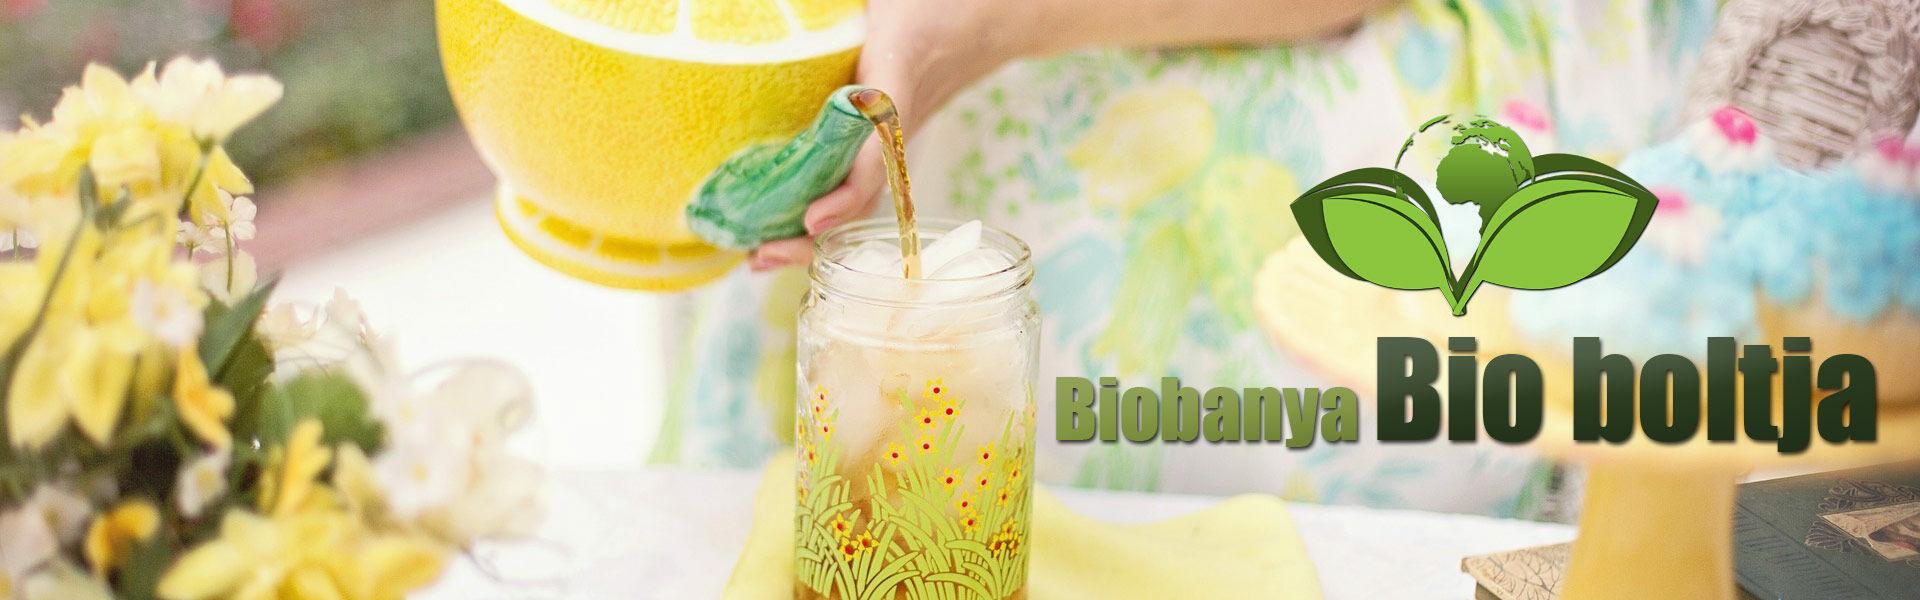 Biobanya-biobolt